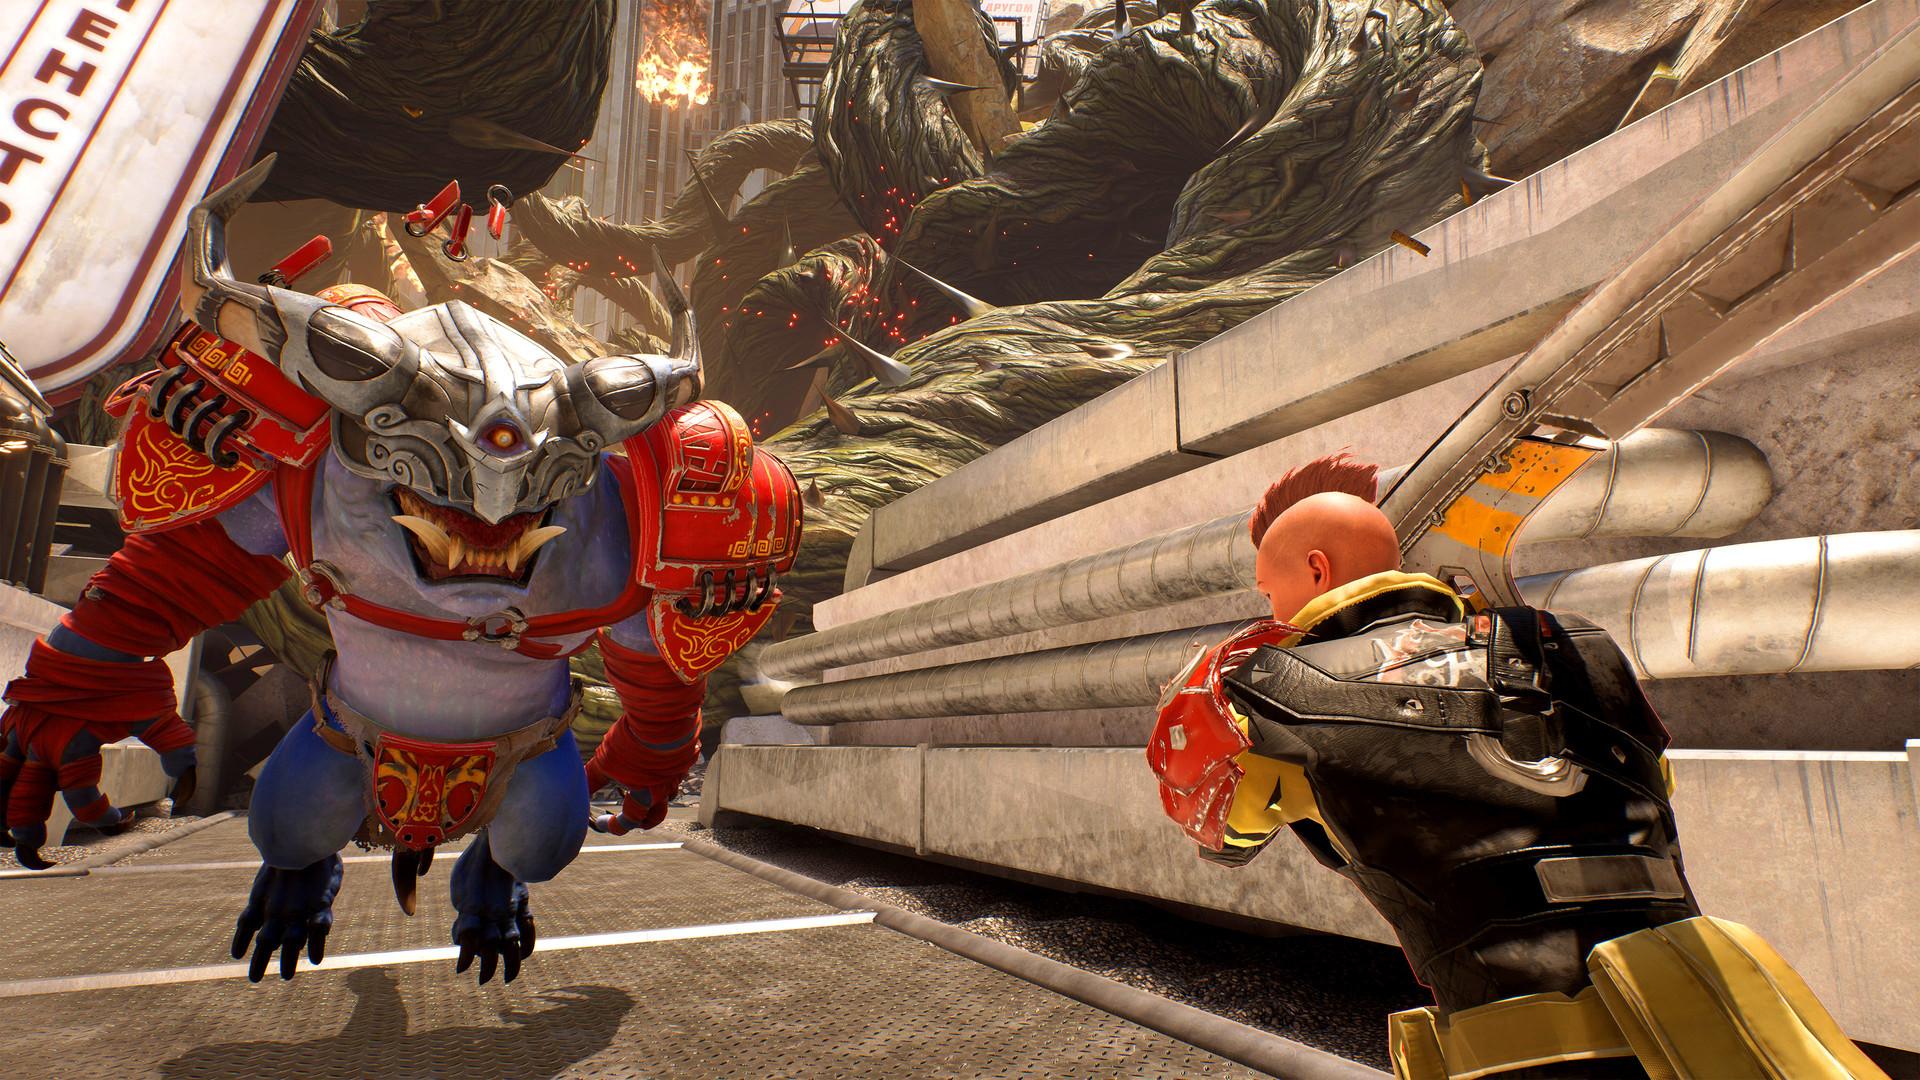 Resultado de imagen para Breach is a competitive co-op dungeon crawler coming to Early Access.